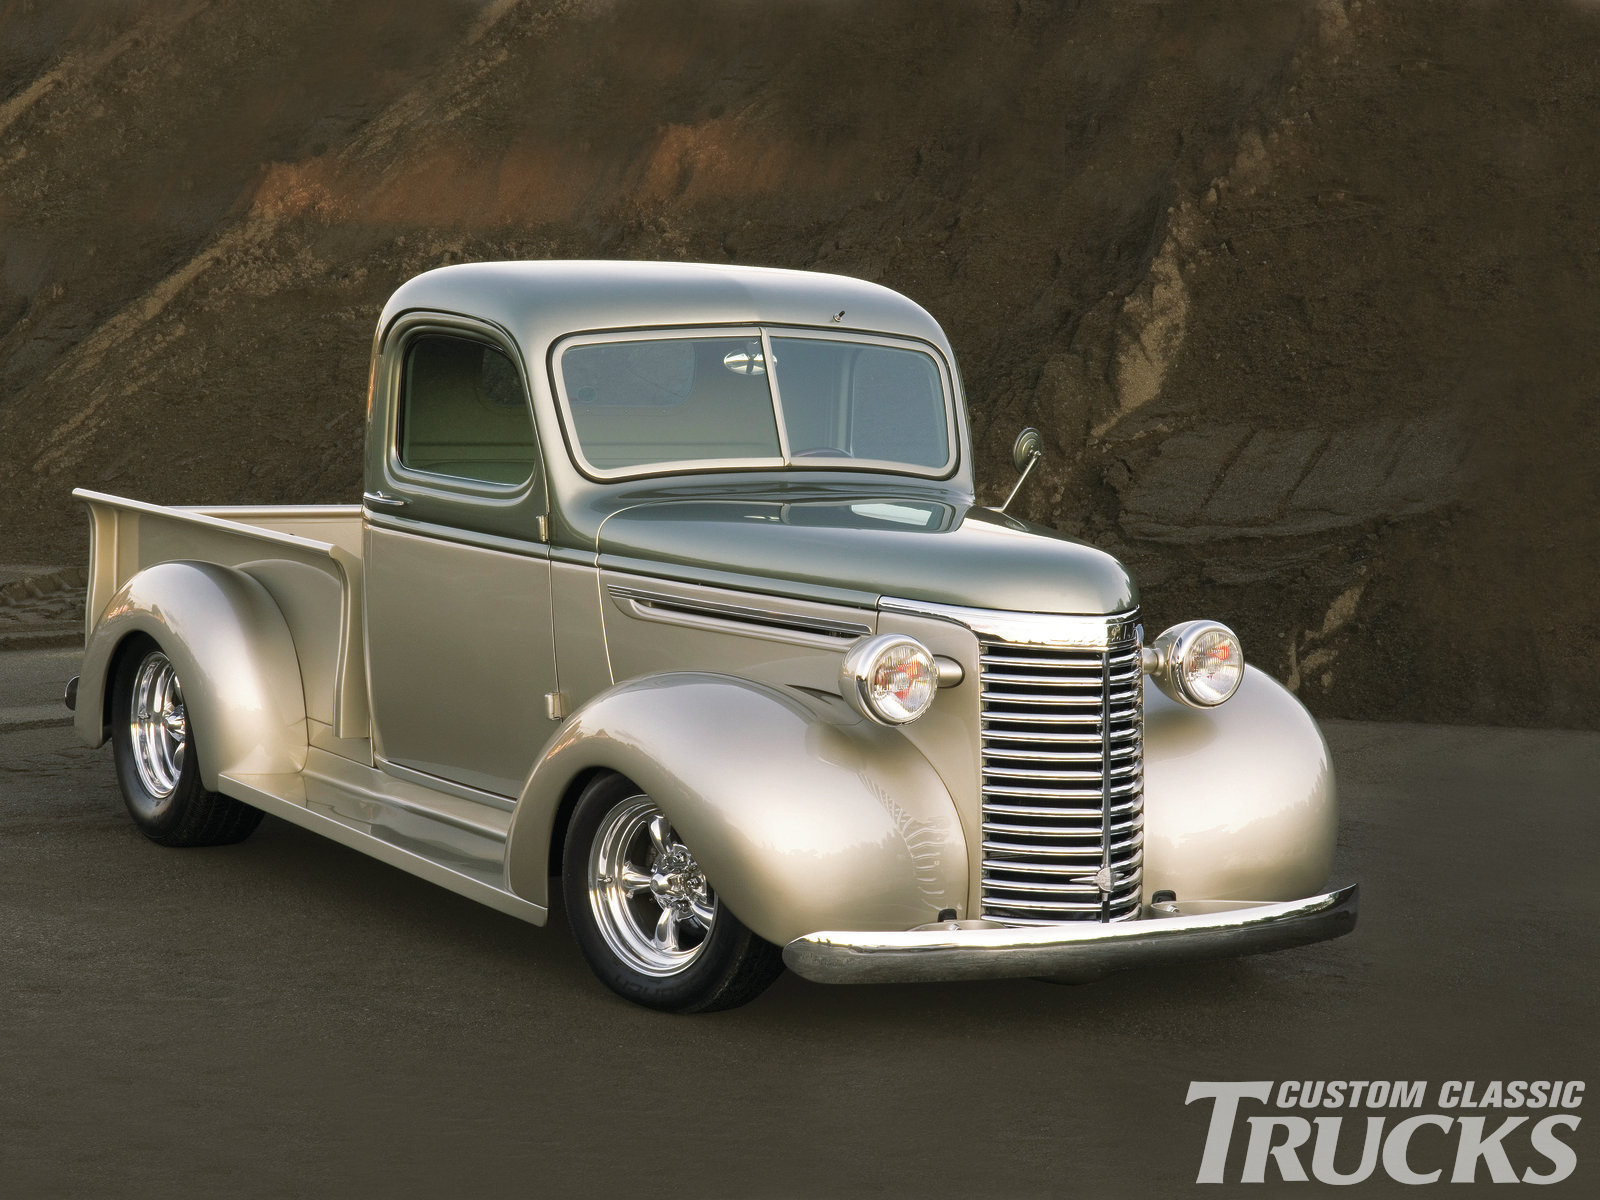 40 Chevrolet Pickup Desktop Wallpaper 1600x1200 Chevrolet Trucks Classic Trucks Classic Trucks Magazine